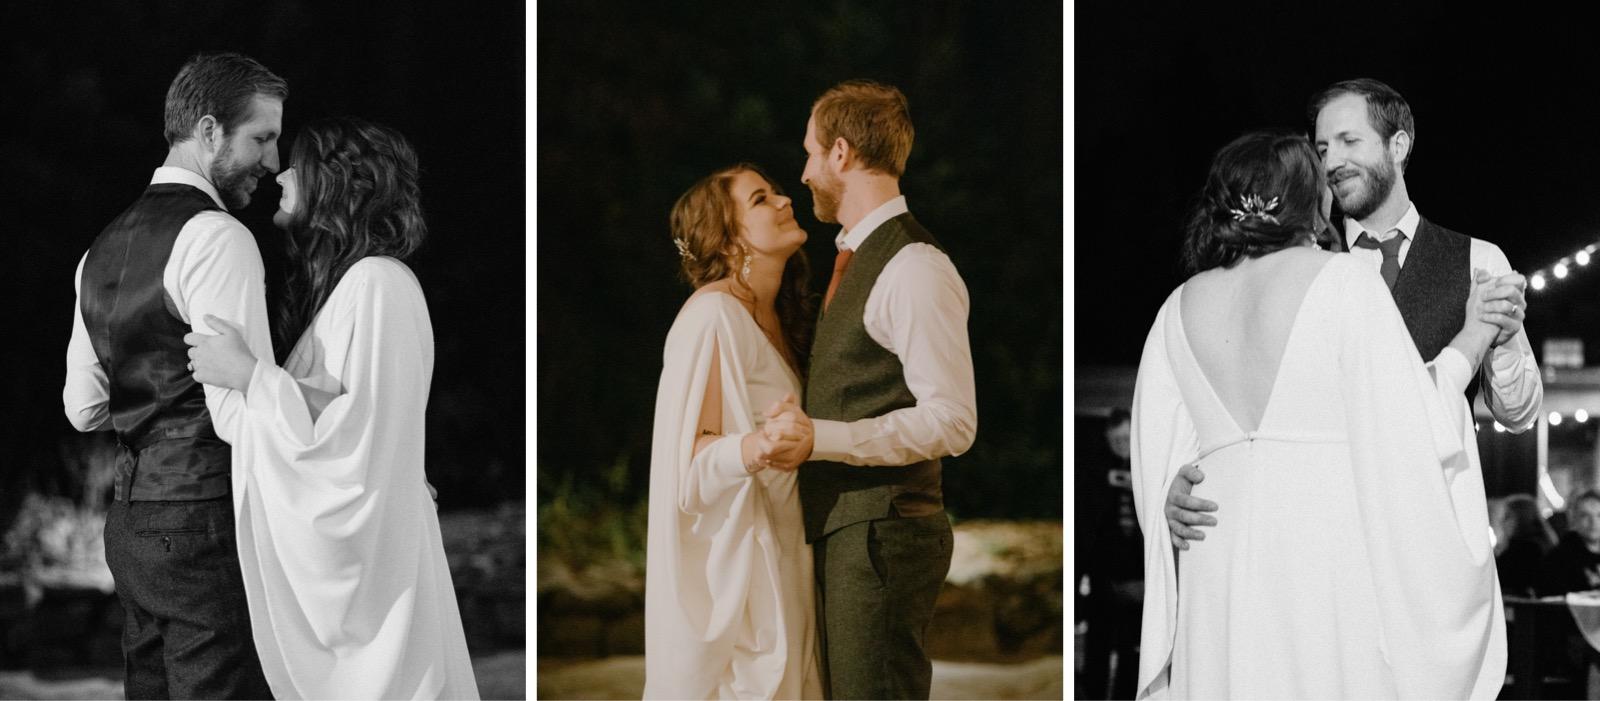 116_Emily & Jeff Wedding 1008_Emily & Jeff Wedding 1007_Emily & Jeff Wedding 1004_waterfall-lodge_couples_wedding_first-dance